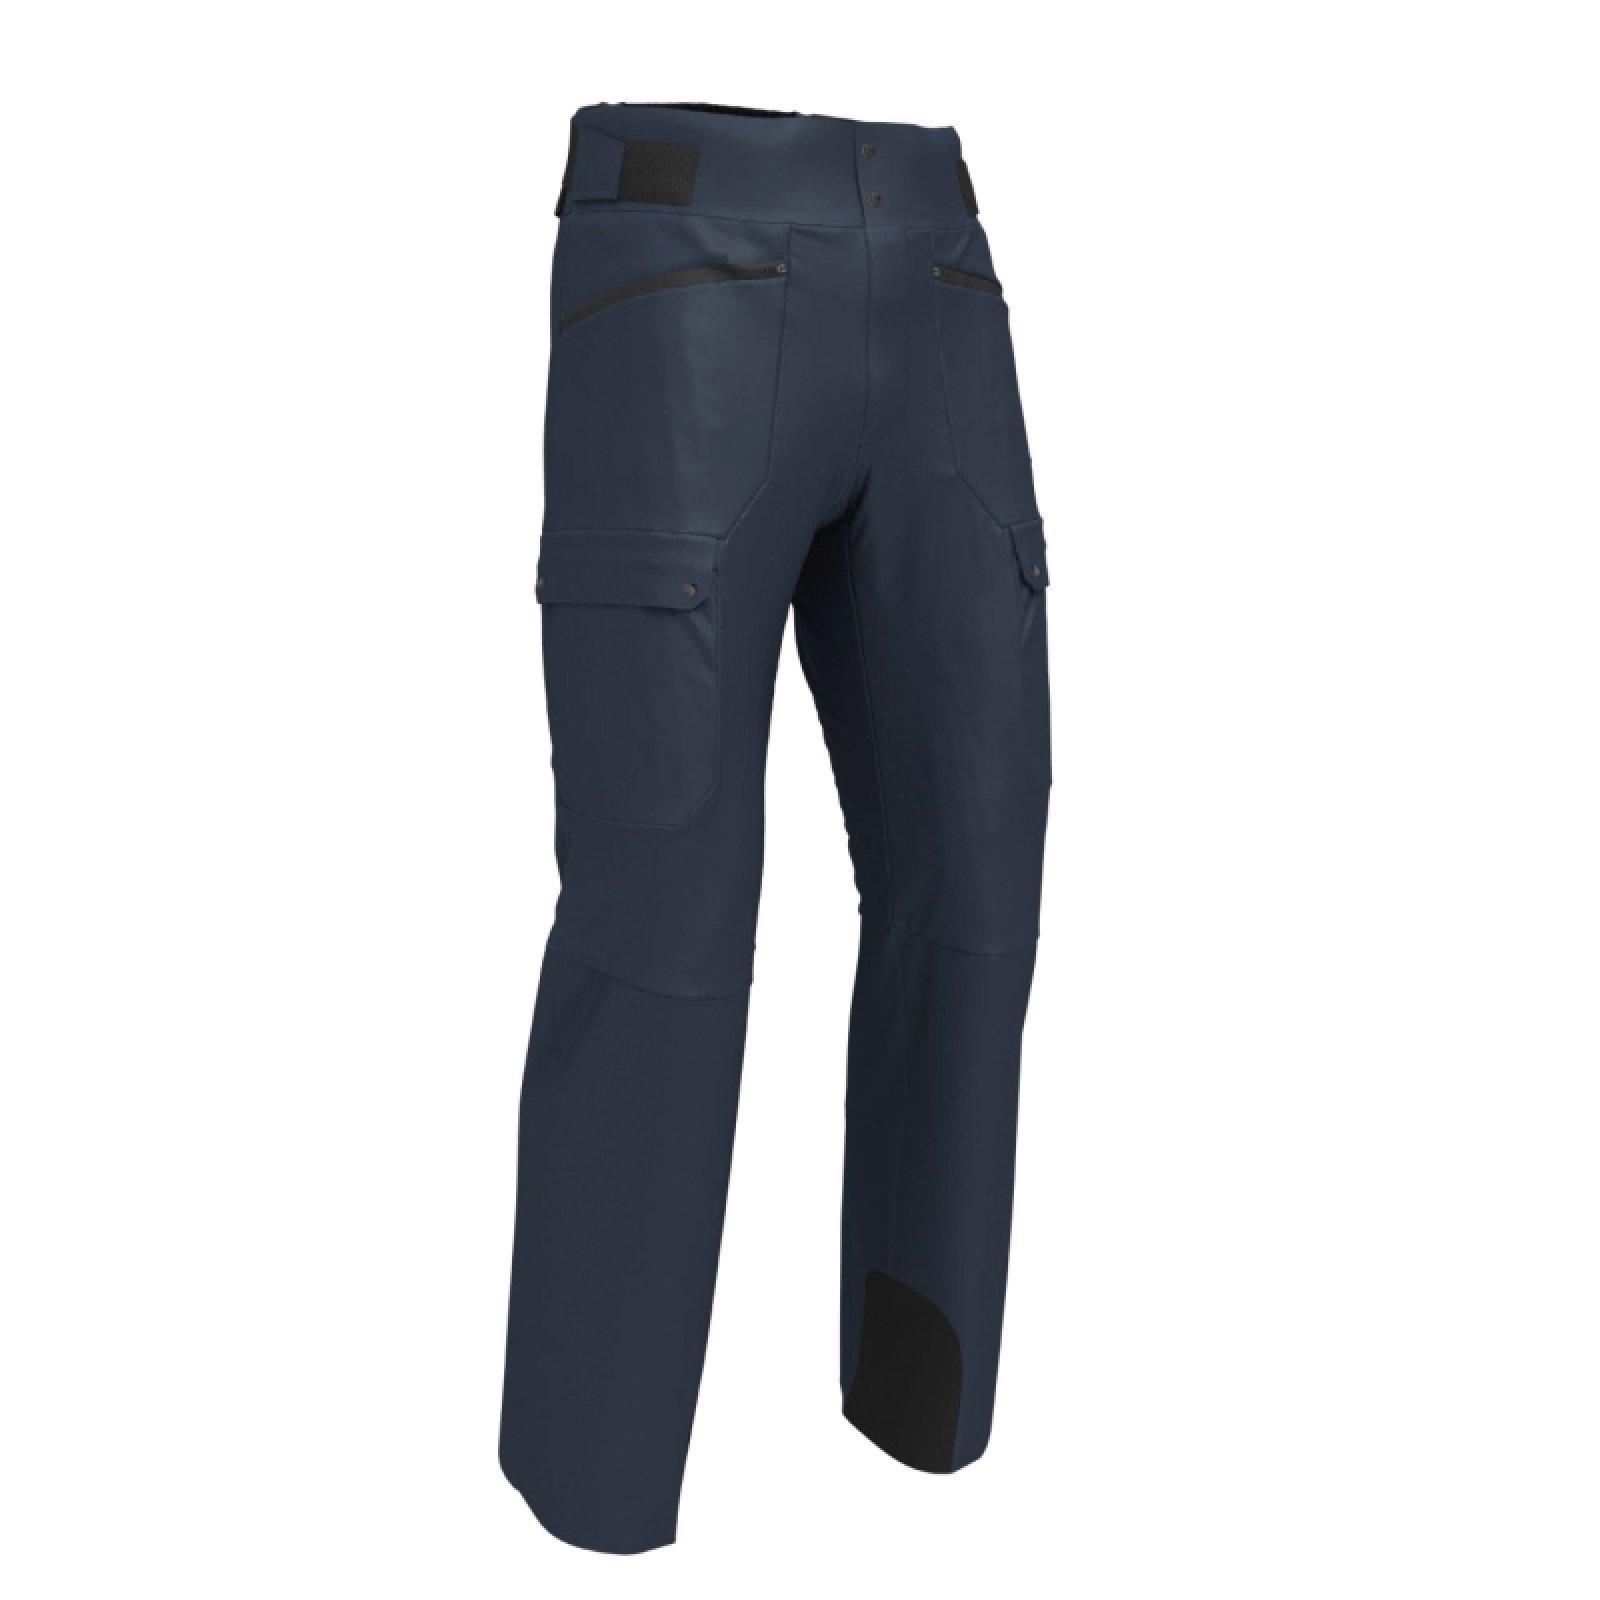 Kalhoty Elan Colmar Pants M - Actisport.cz 49a15bf9e1